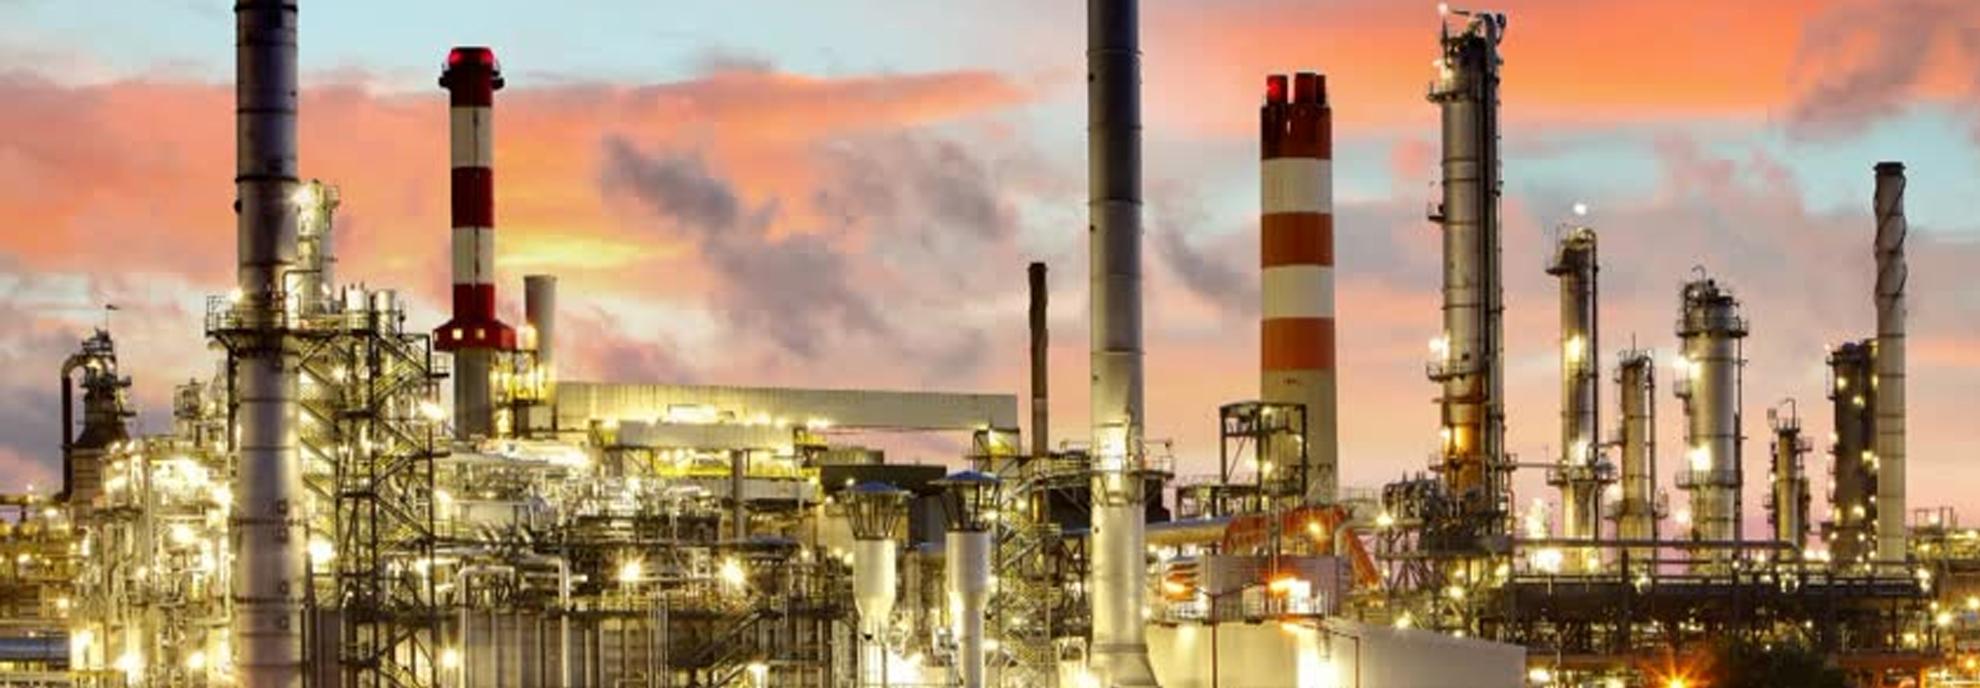 Dholera SIR Mega Industrial Park